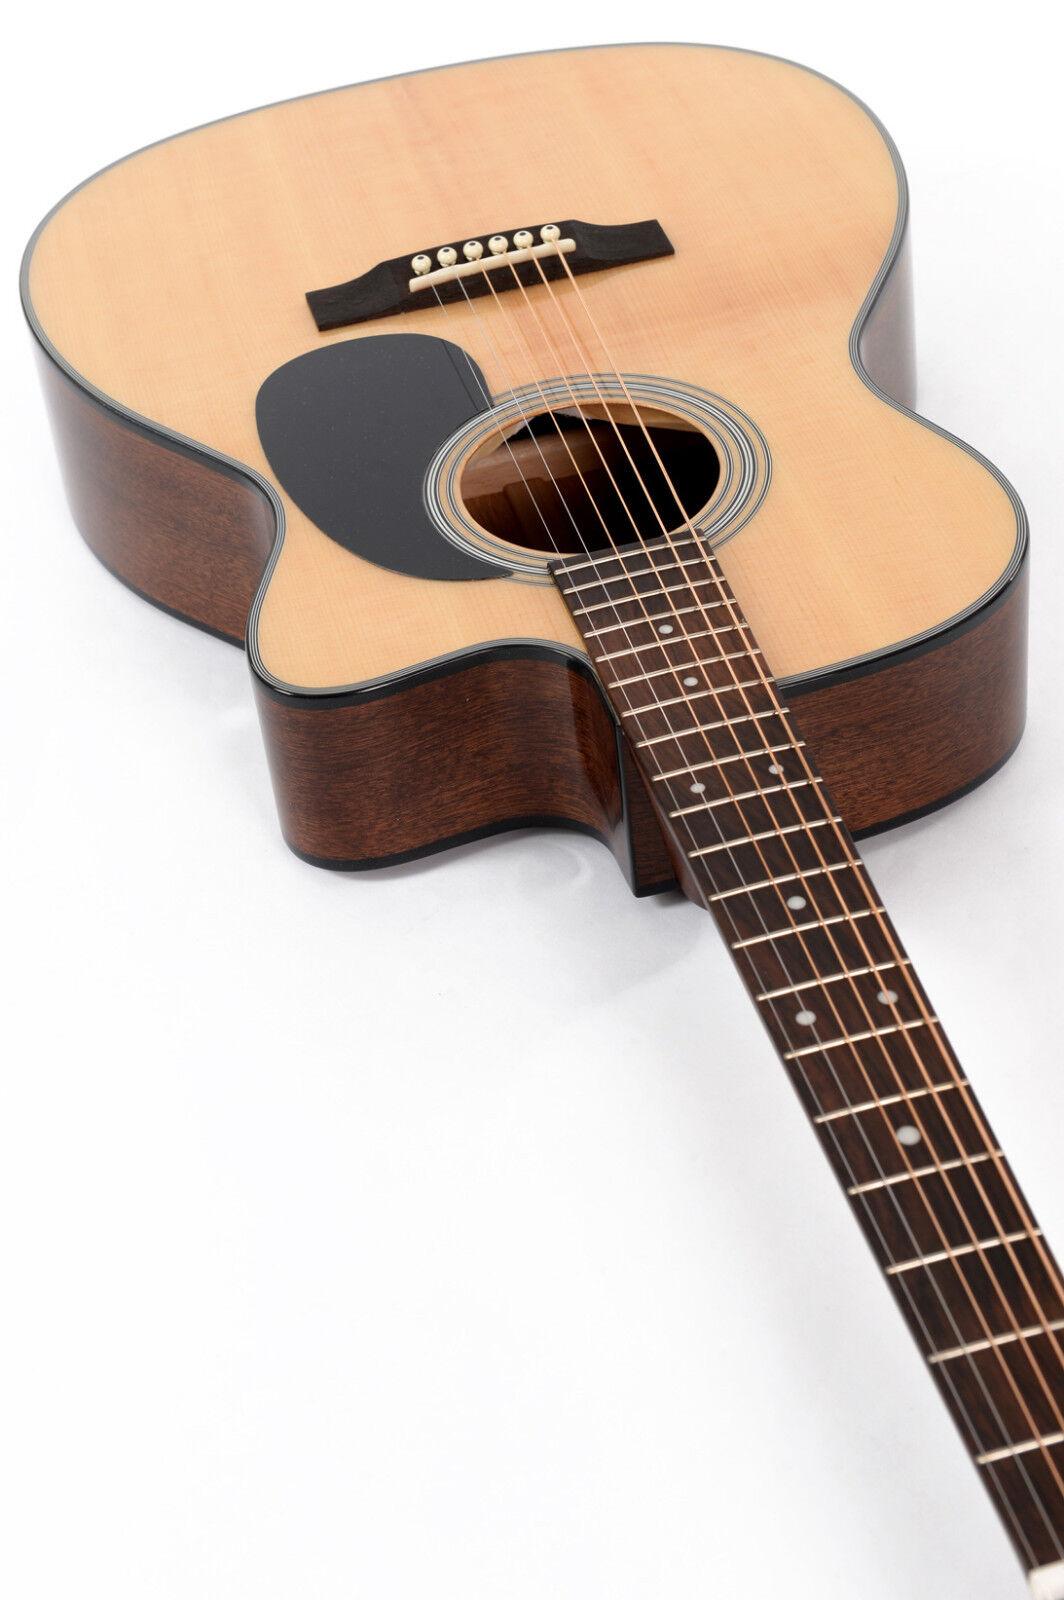 Western-Gitarre Western-Gitarre Western-Gitarre Sigma 000MC-1STE mit Fishman Isys Tonabnehmer und Stimmgerät 950c8e